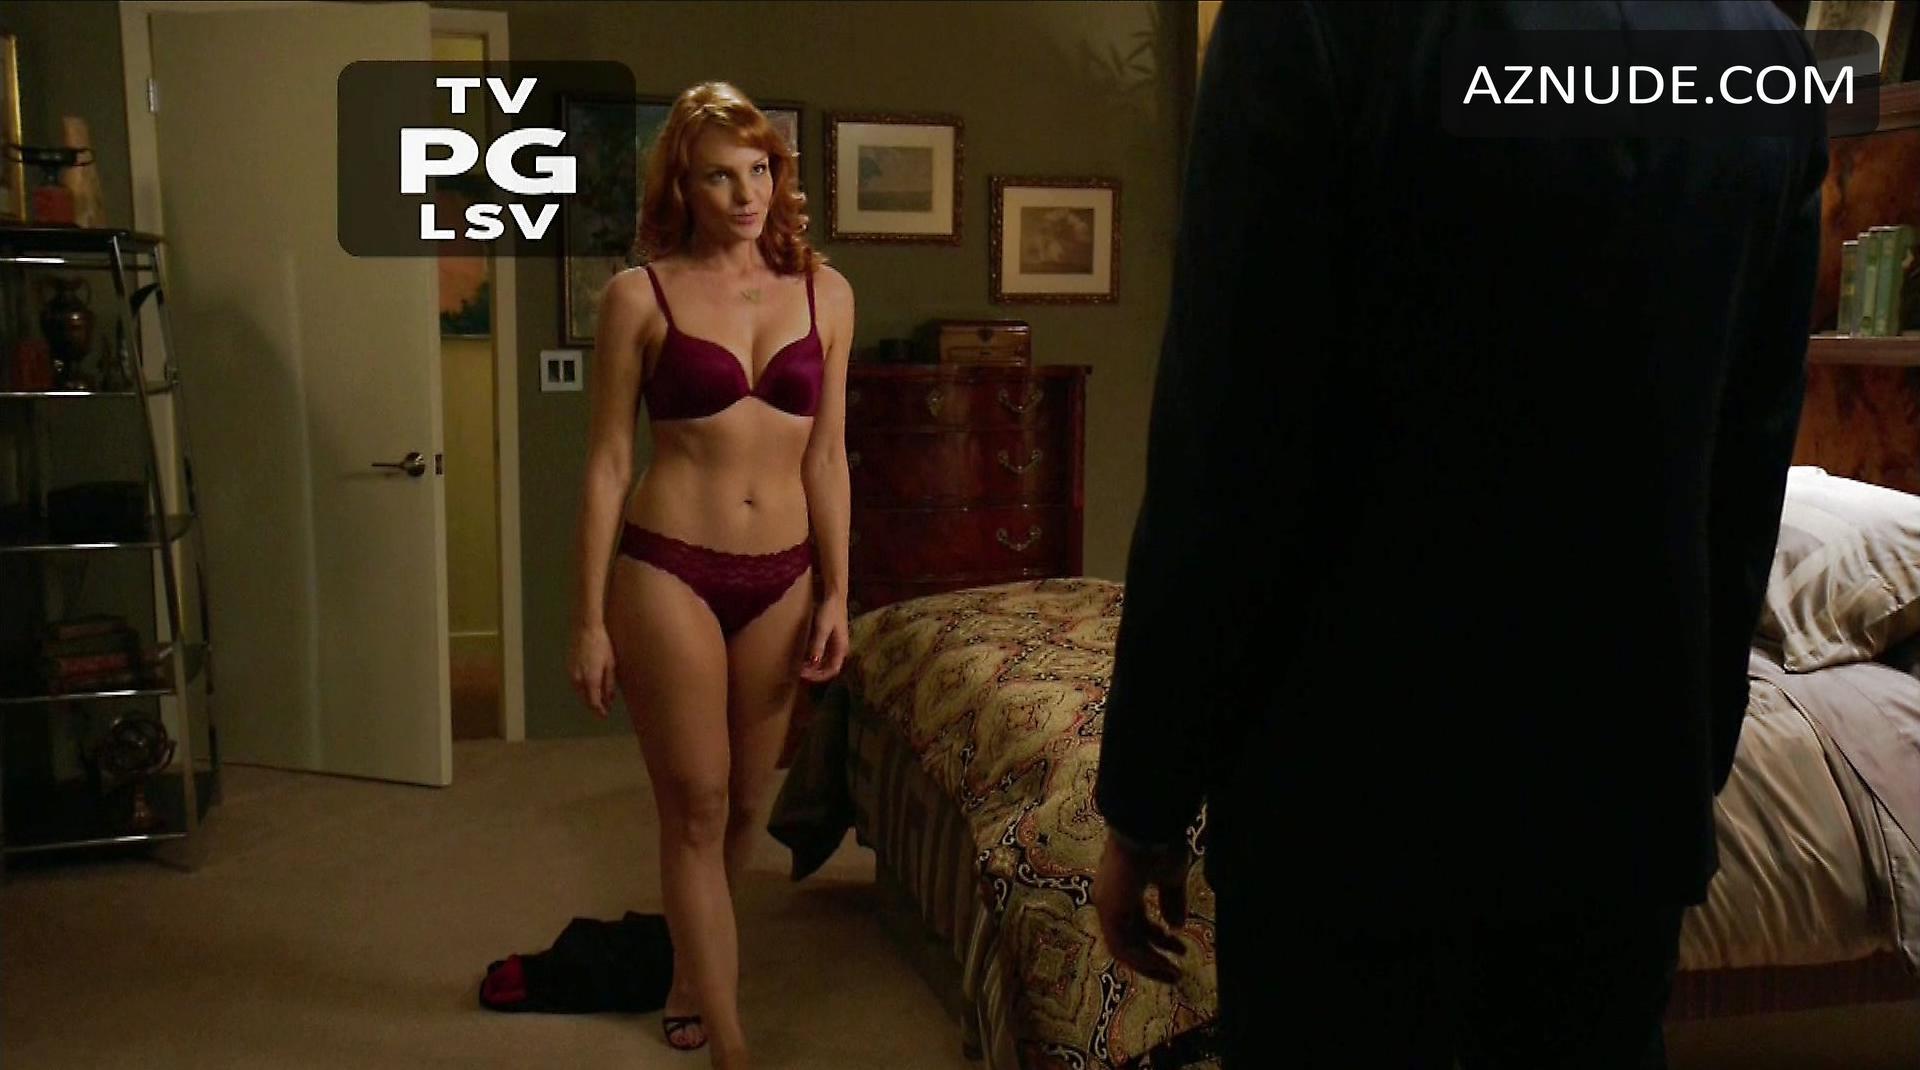 Leighton meester sex tape - 2 part 10